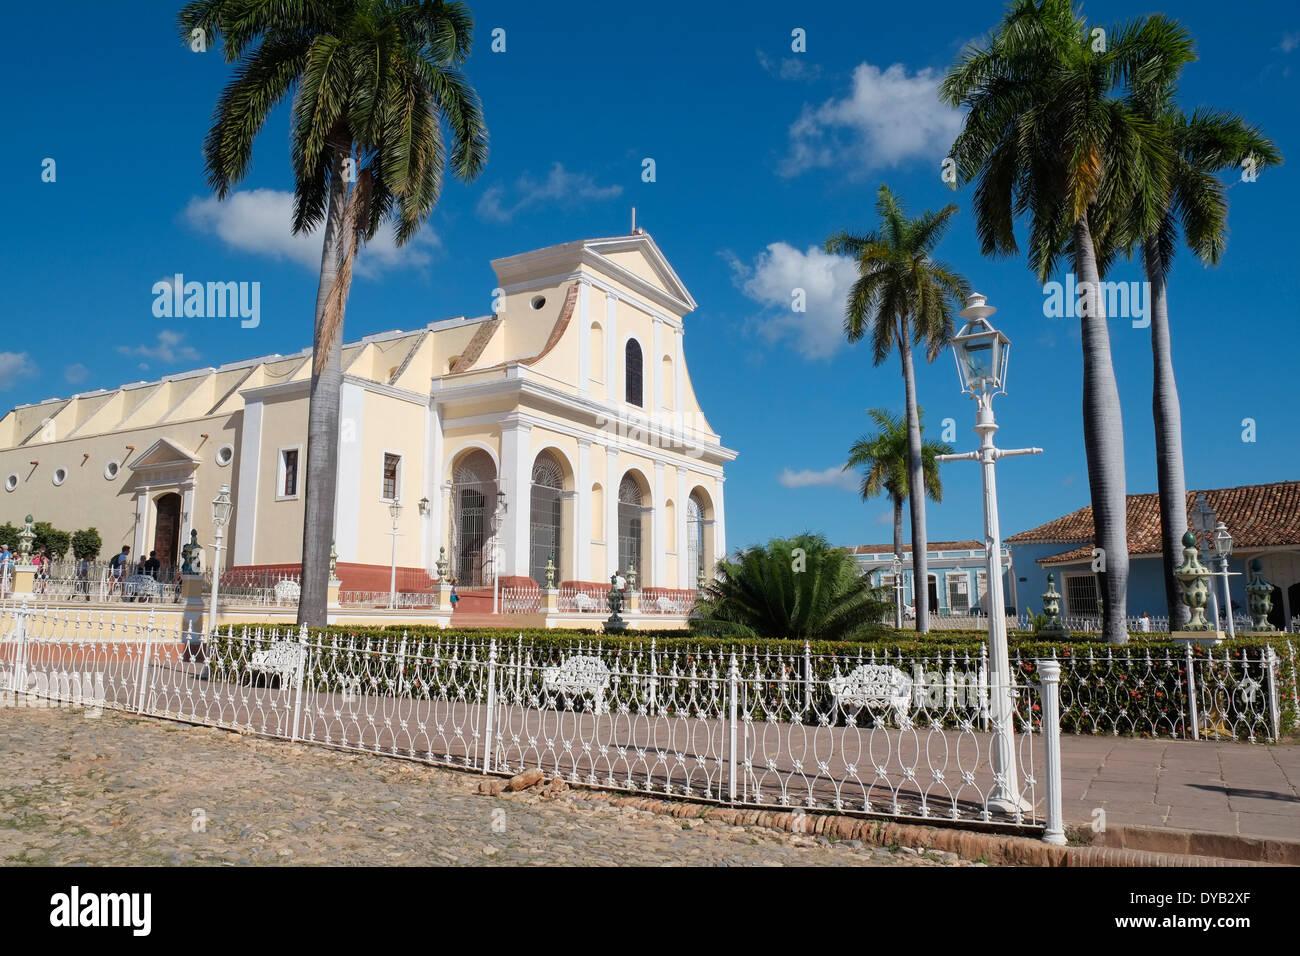 The Iglesia Parroquial de la Santísima (Church of the Holy Trinity), Plaza Mayor, Trinidad, Cuba. - Stock Image